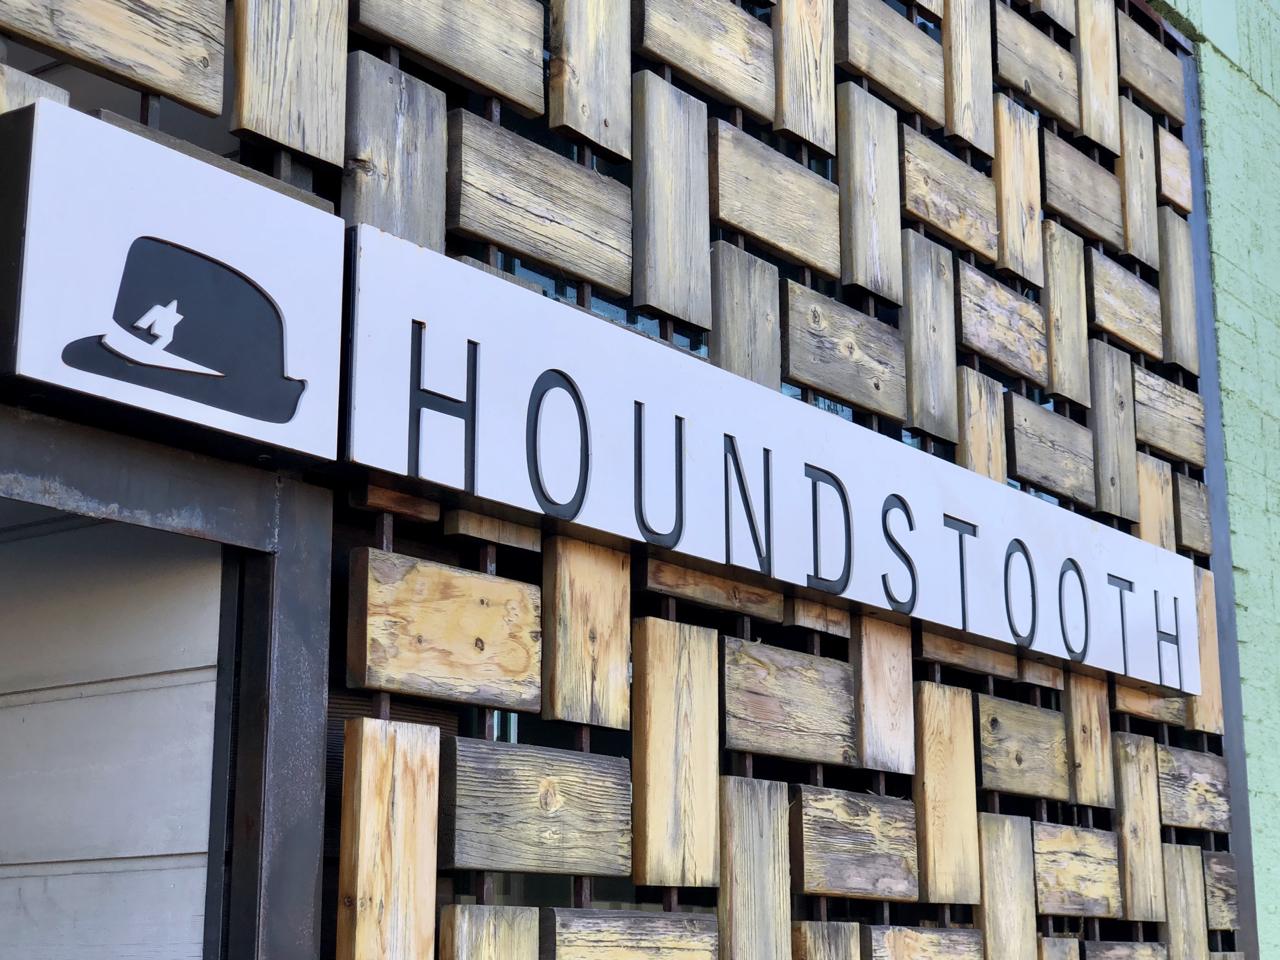 Status: Houndstooth